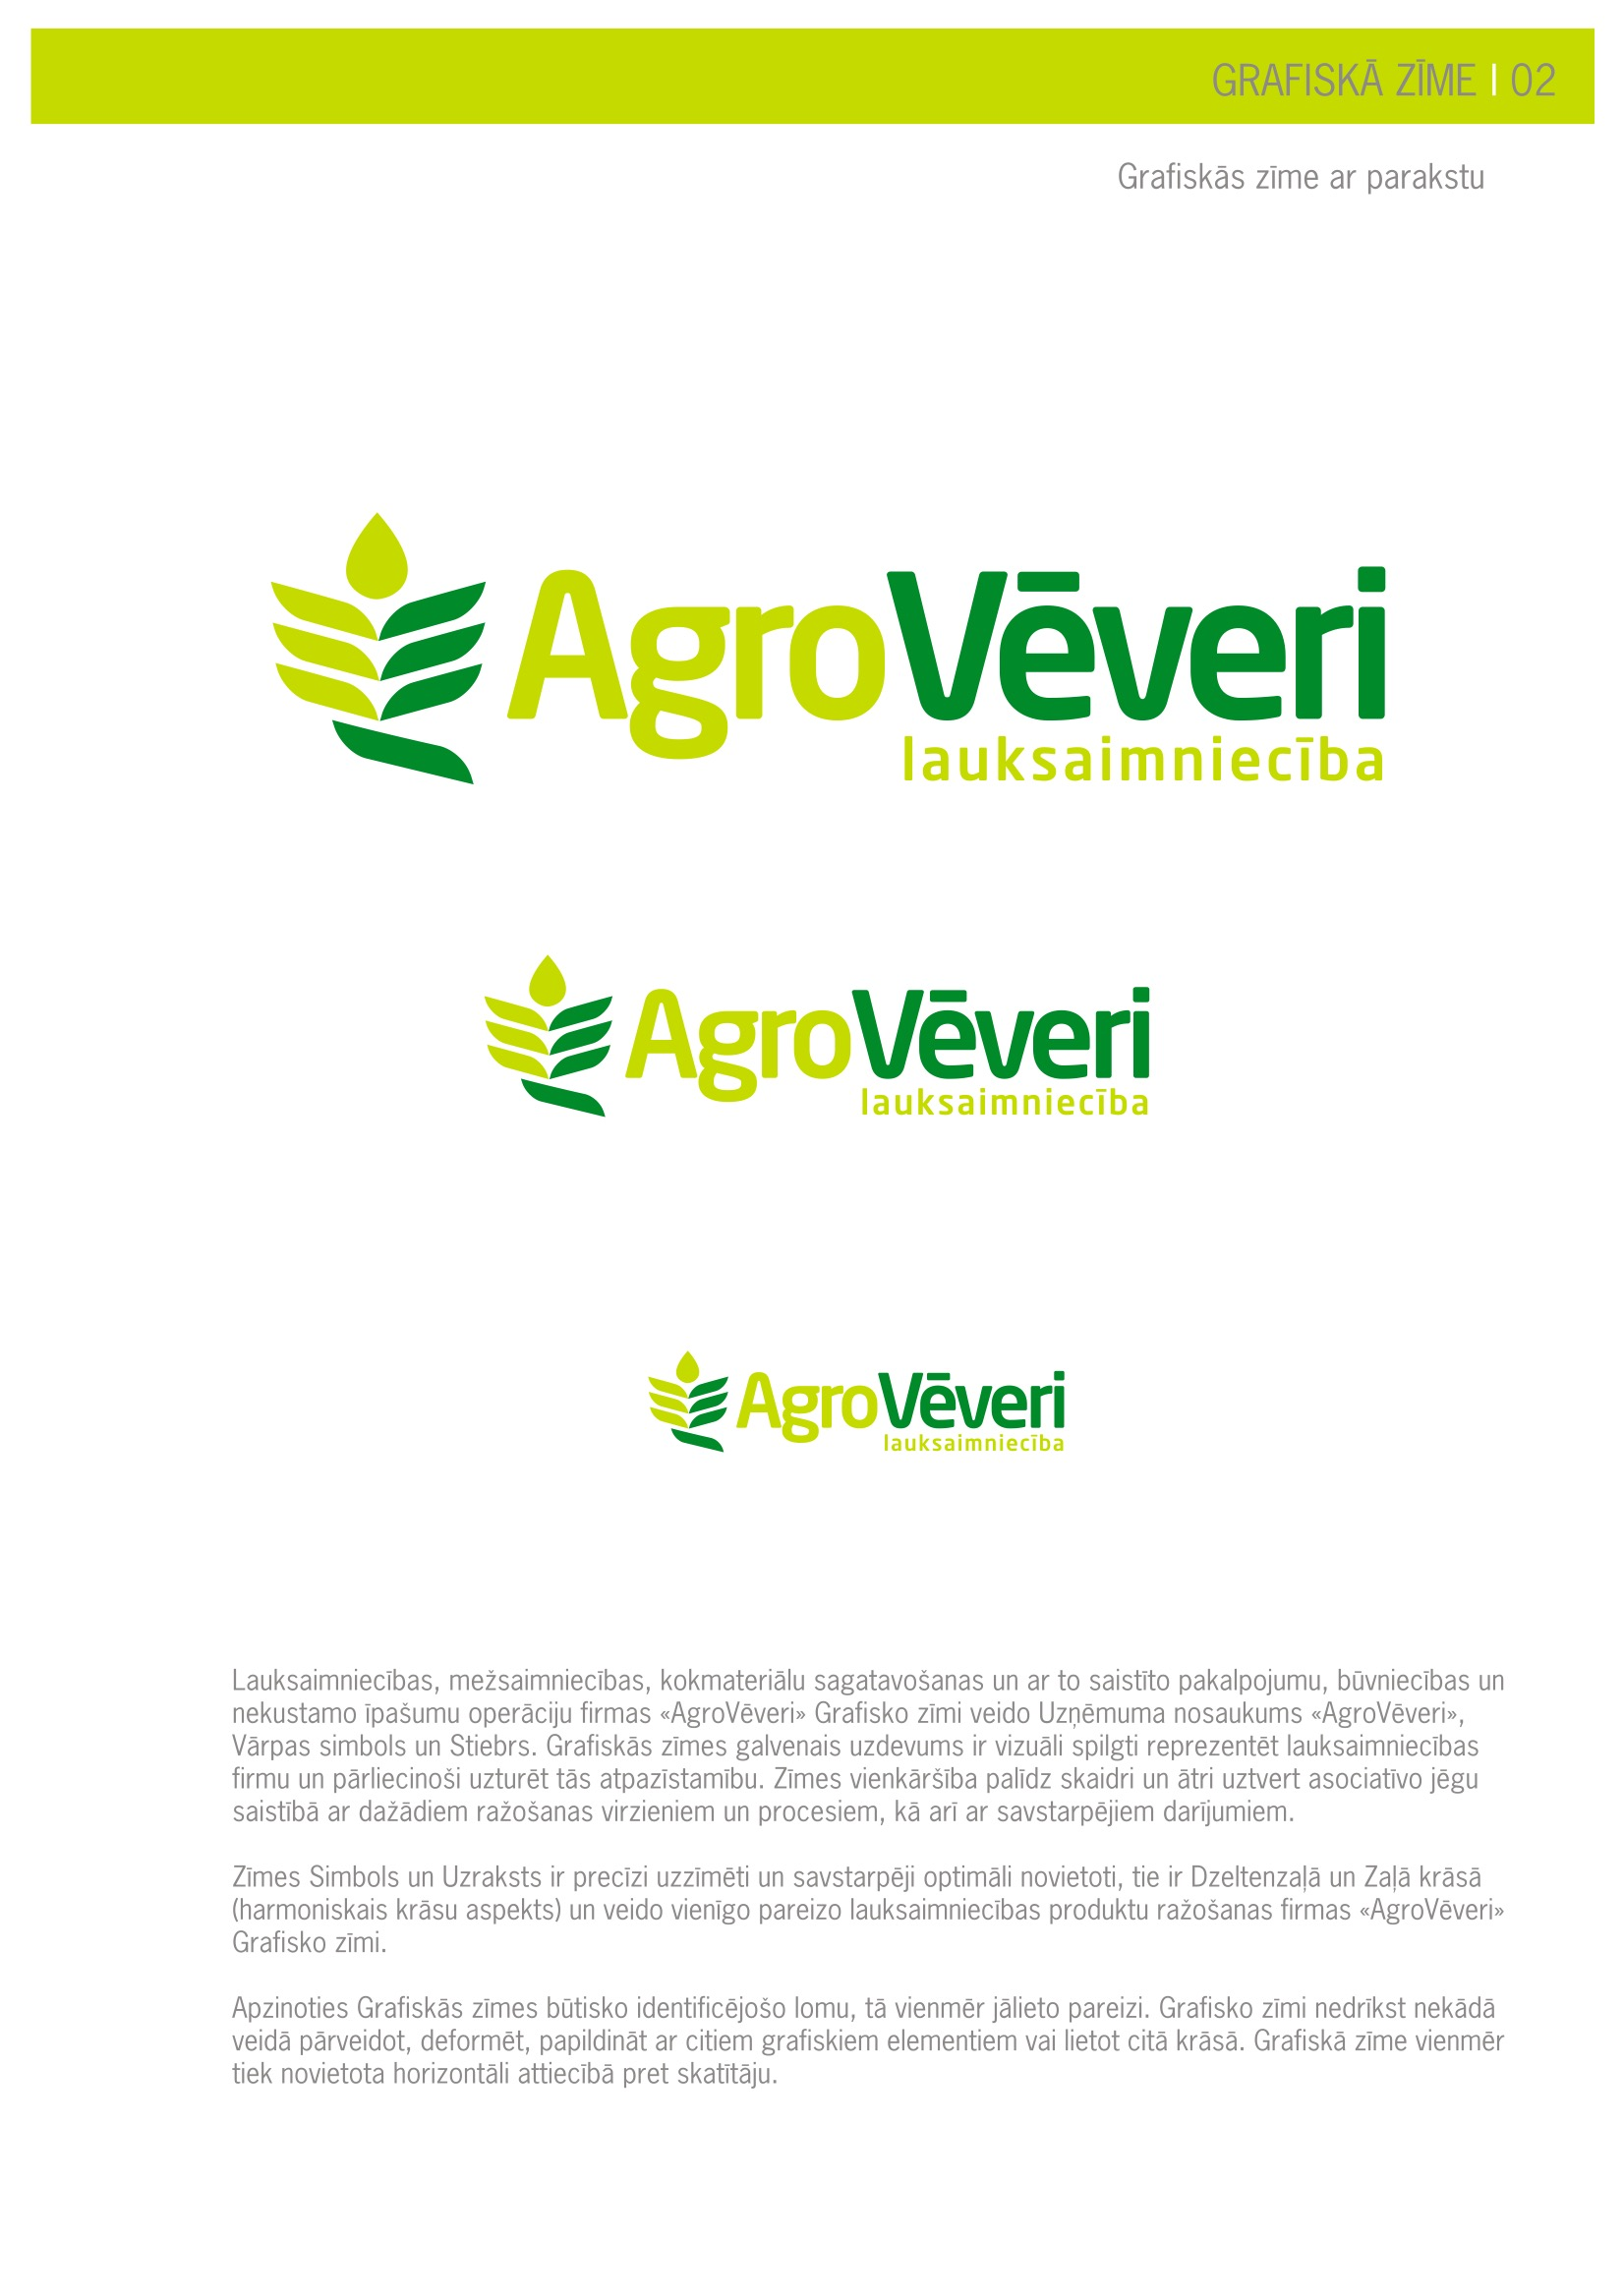 Agroveveri_Stils 2